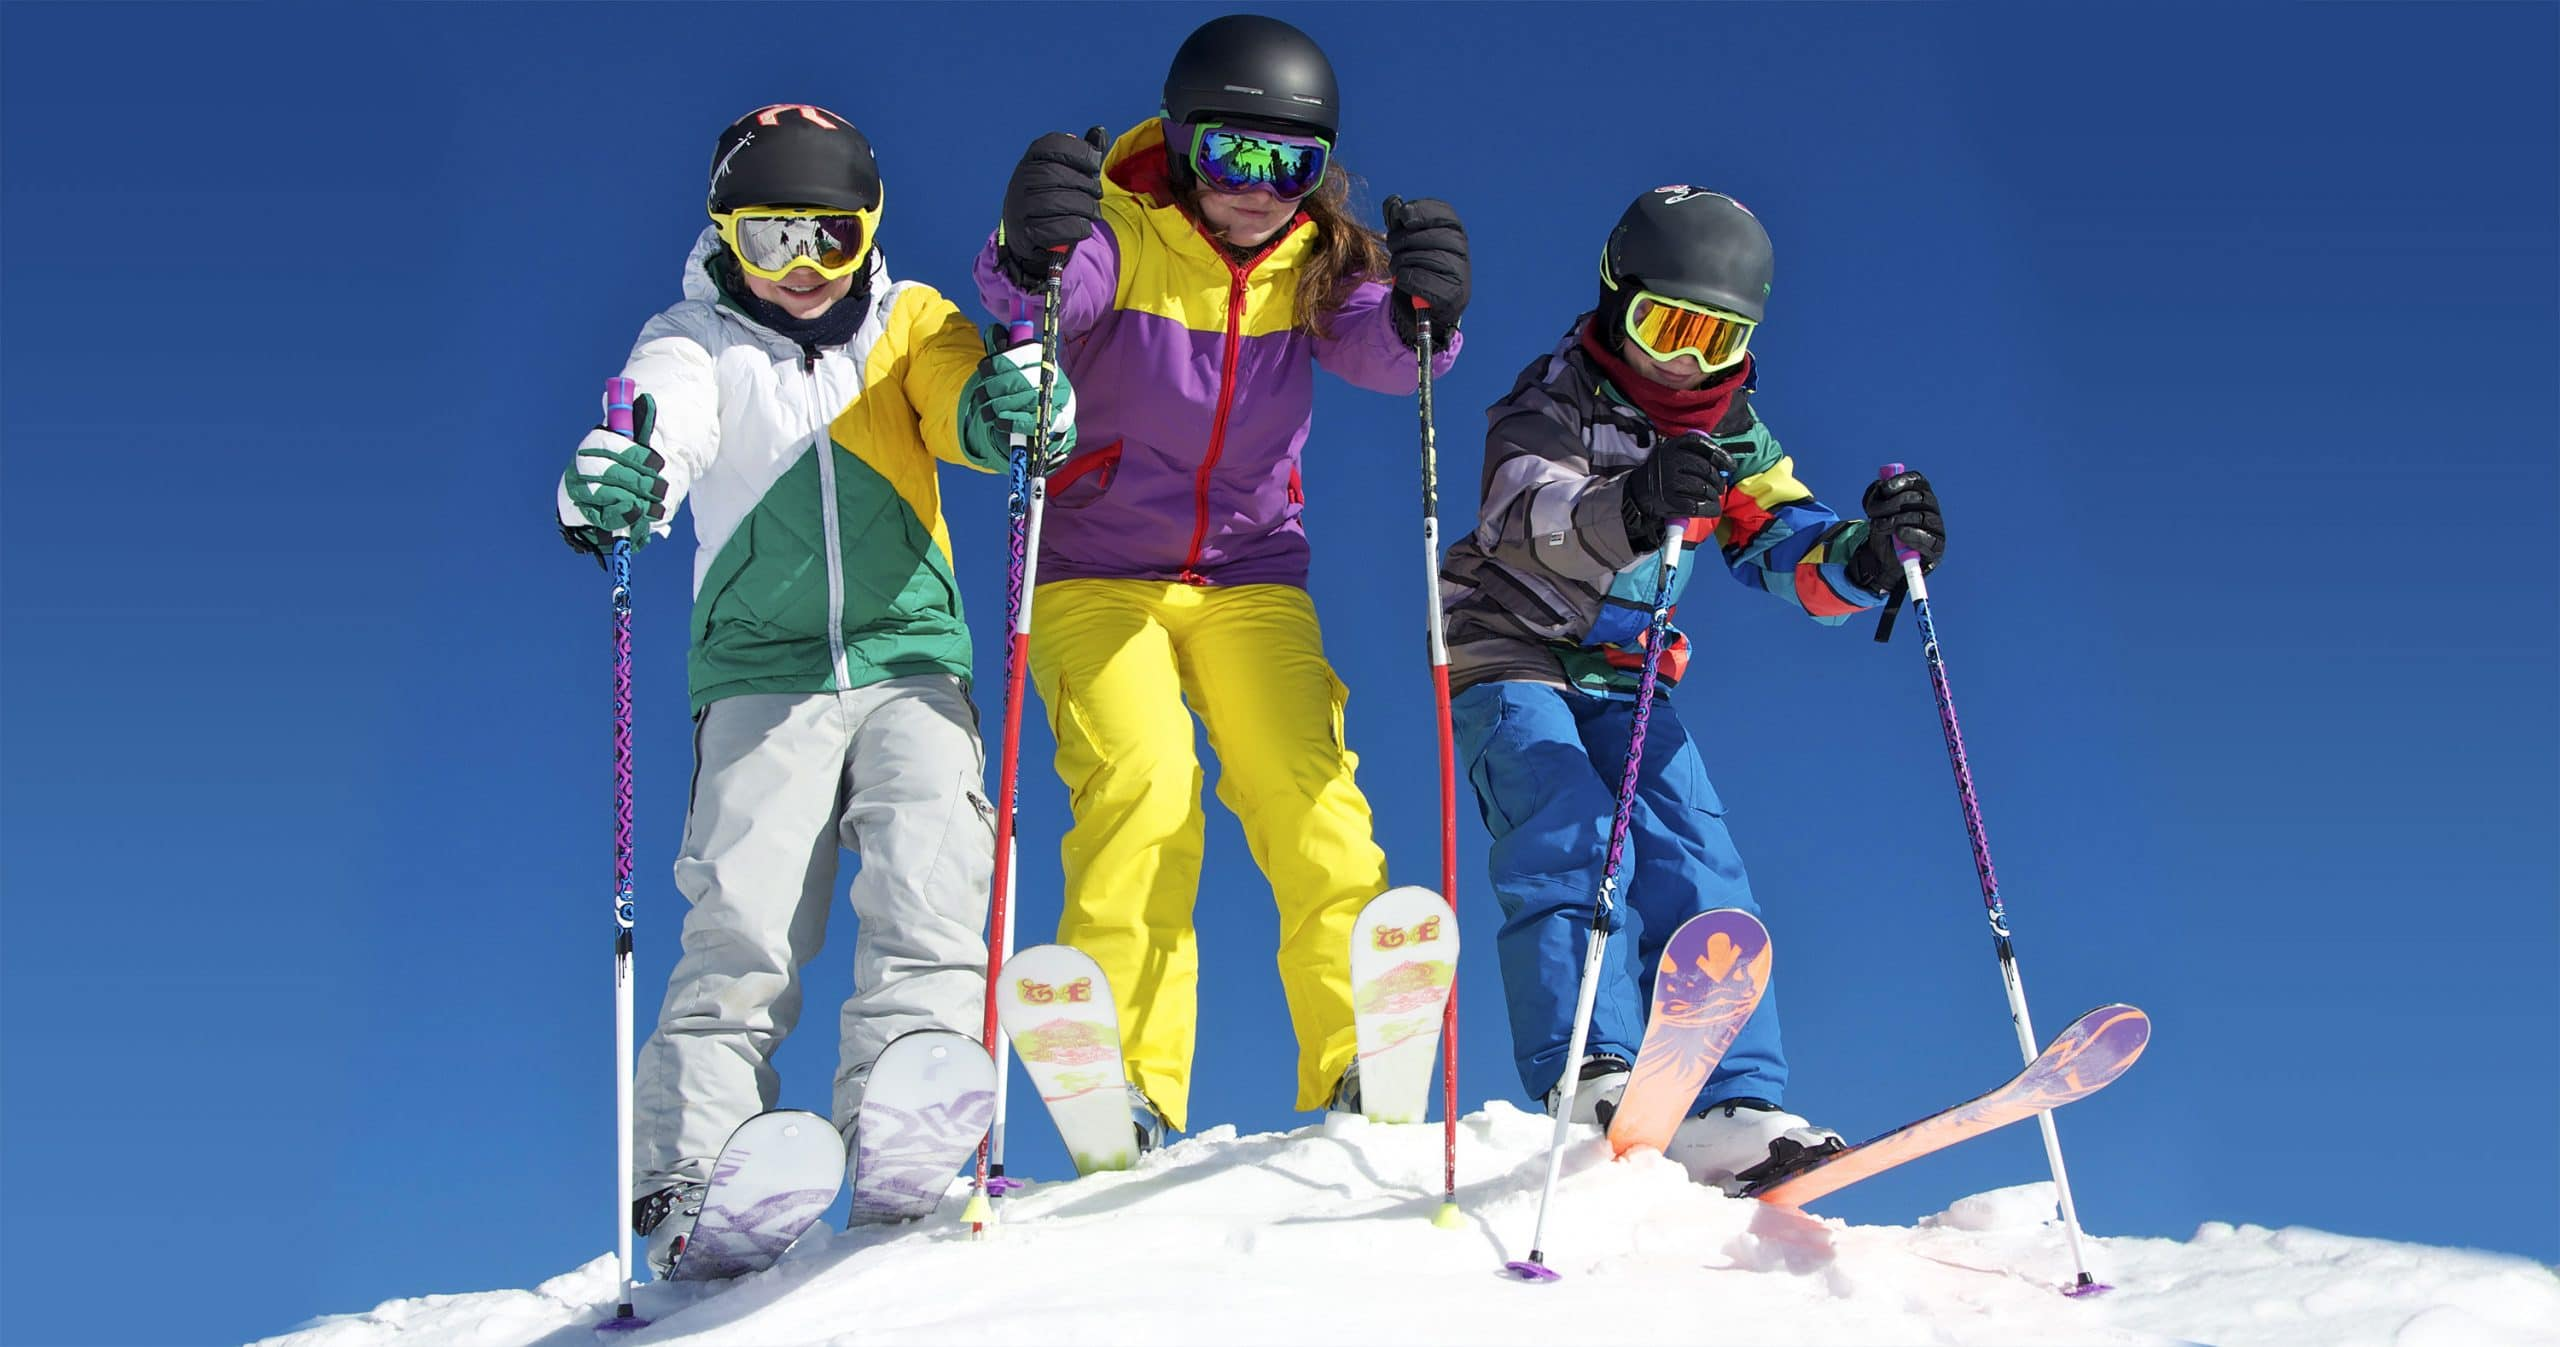 Skischulen-am-Alpen-Caravanpark-Tennsee-Bayern